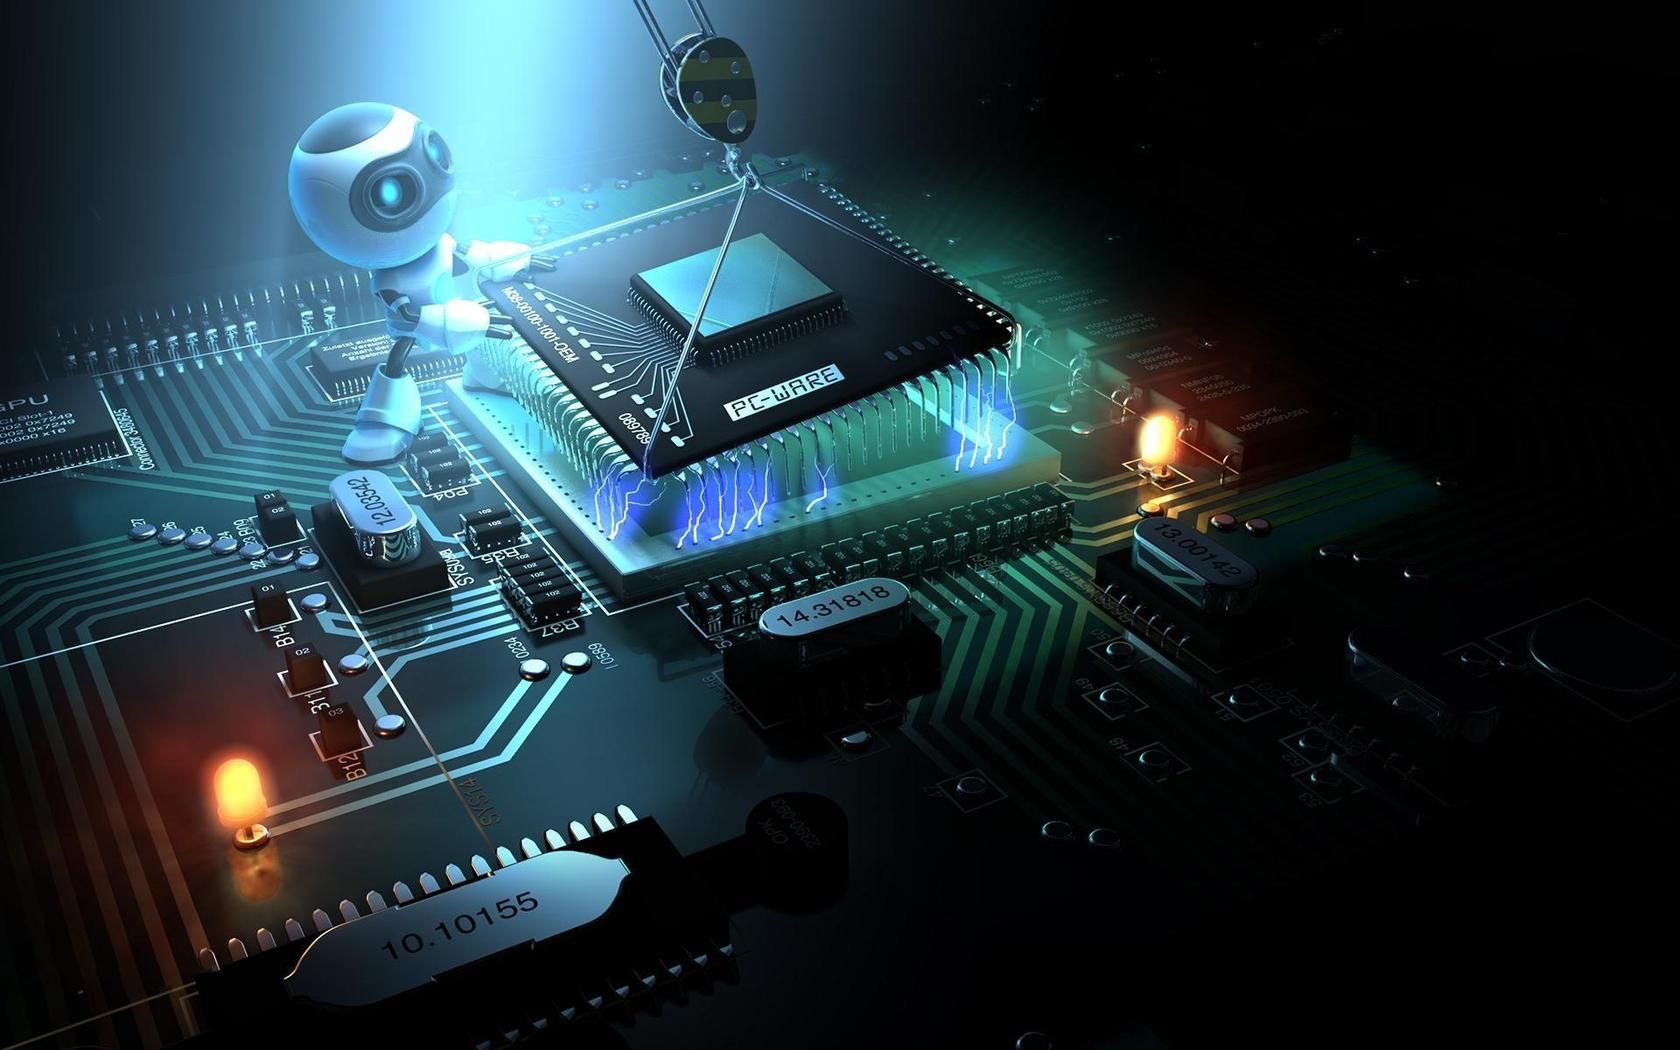 Pin Oleh Suraj Singh Di Technology Perangkat Lunak Electronics Projects Teknologi Komputer